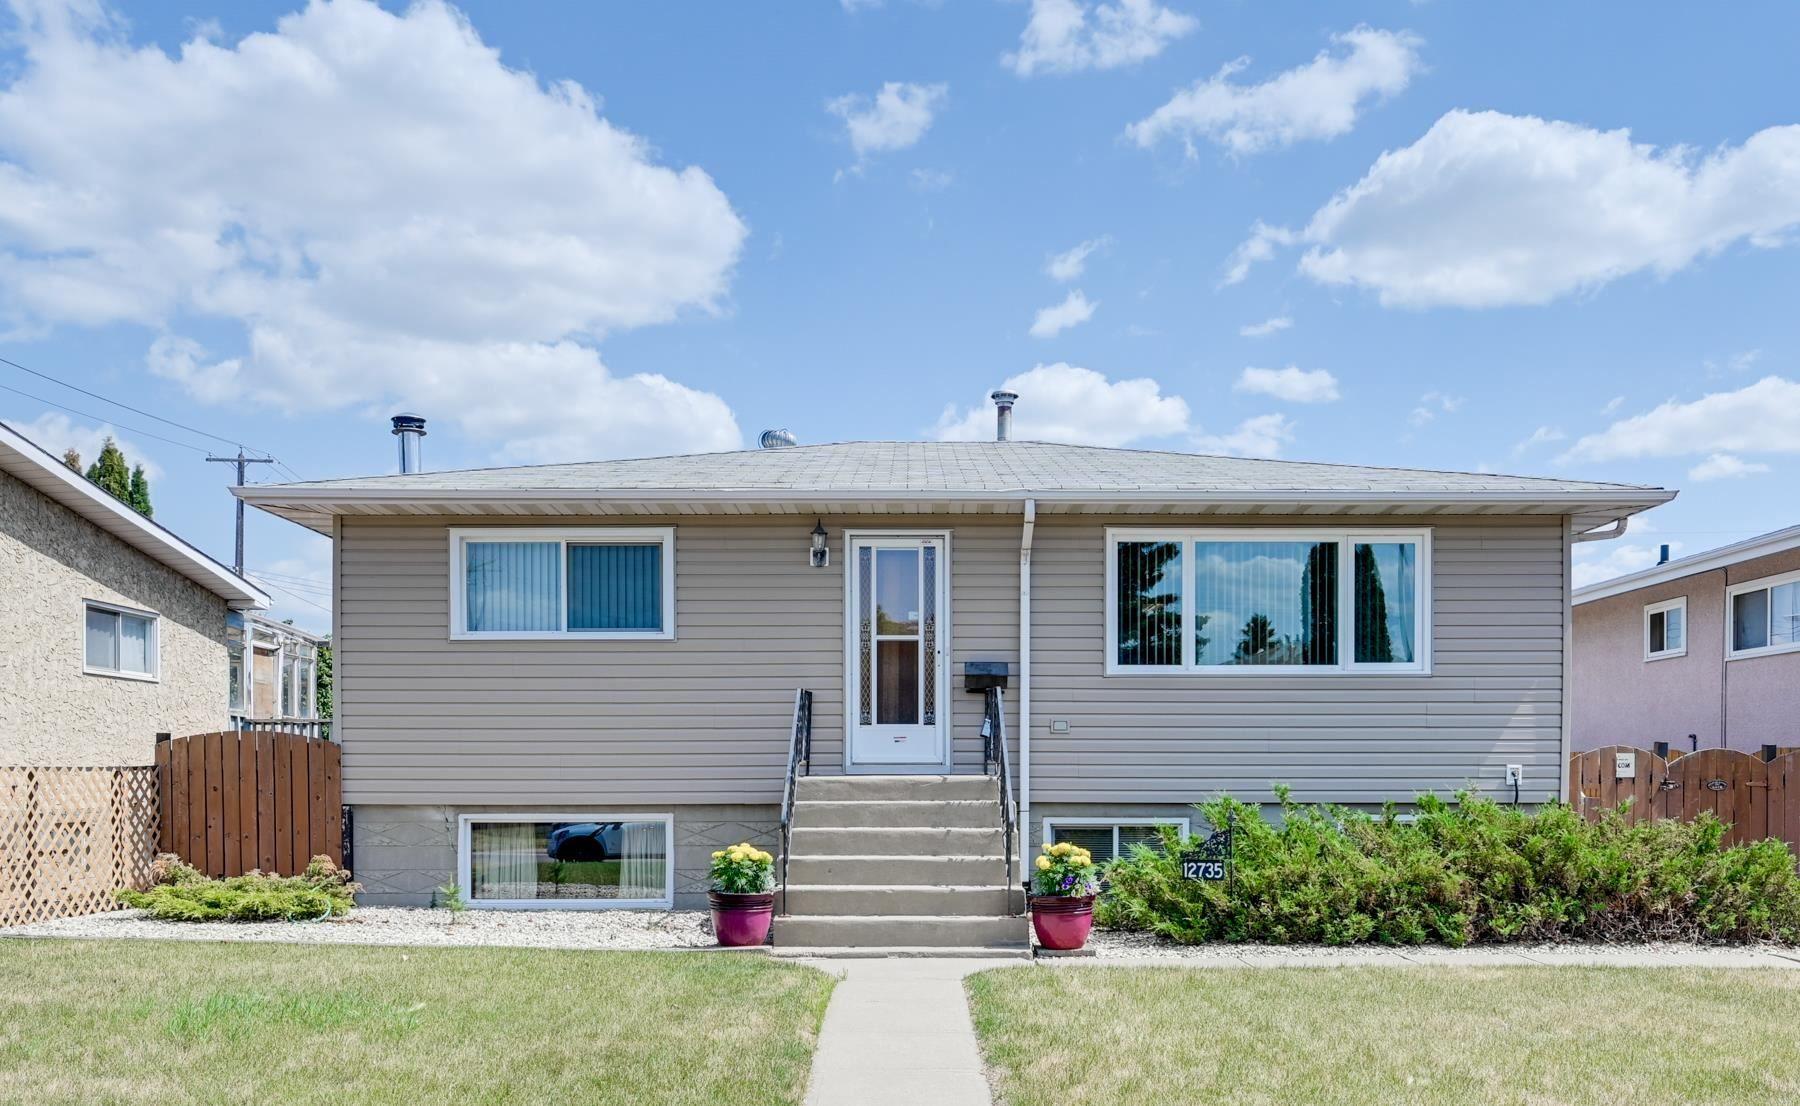 Main Photo: 12735 89 Street in Edmonton: Zone 02 House for sale : MLS®# E4254123